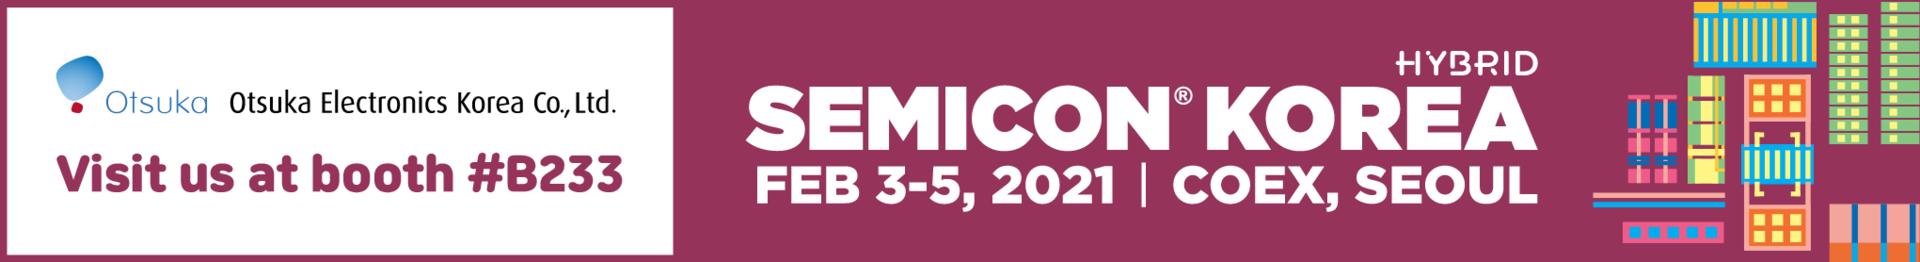 Otsuka Electronics Korea will be attending SEMICON KOREA(booth #B233)